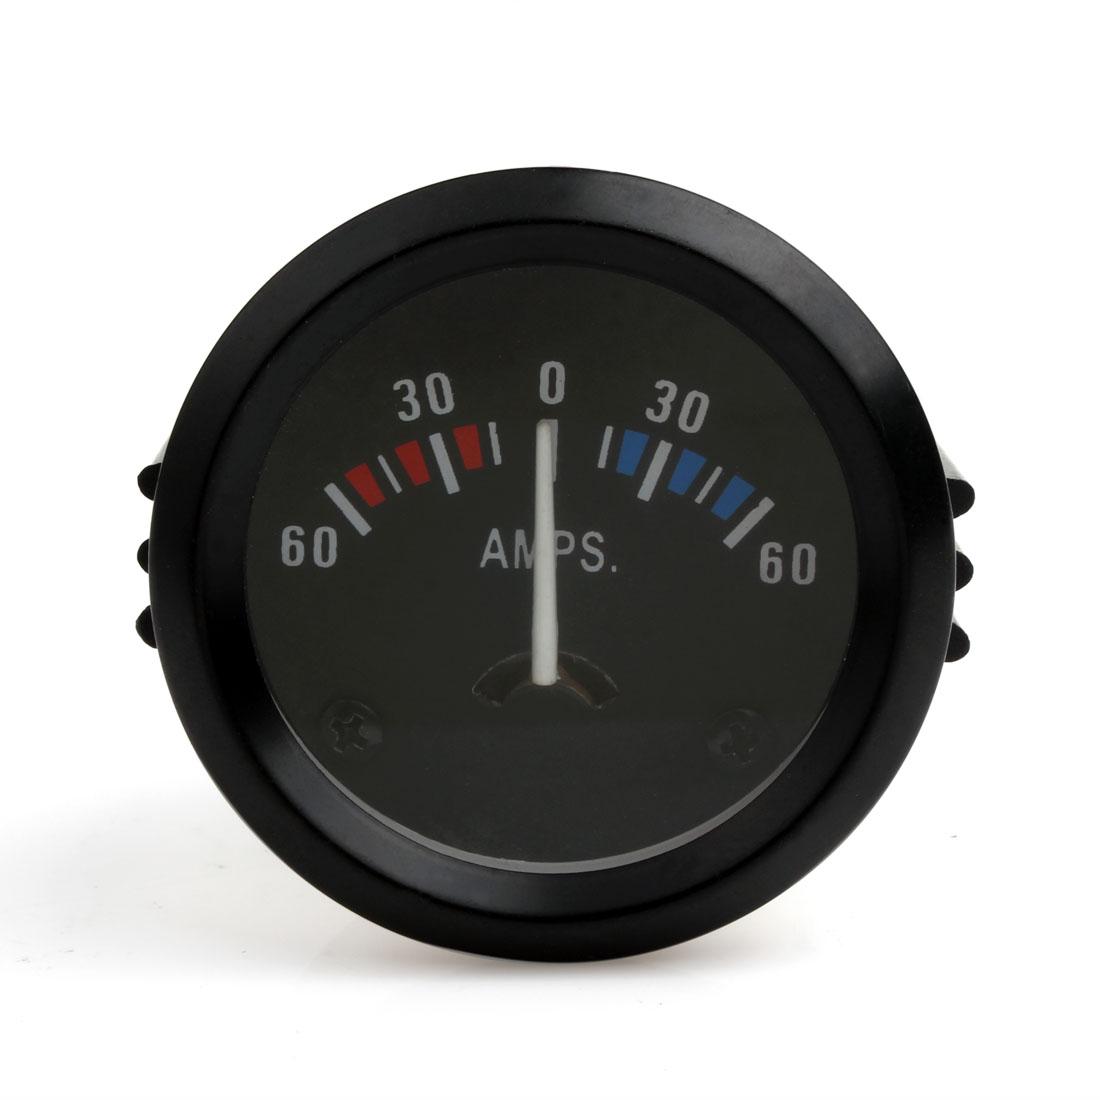 Auto Meter Ammeter : Wholesale inch mm universal ammeter amp